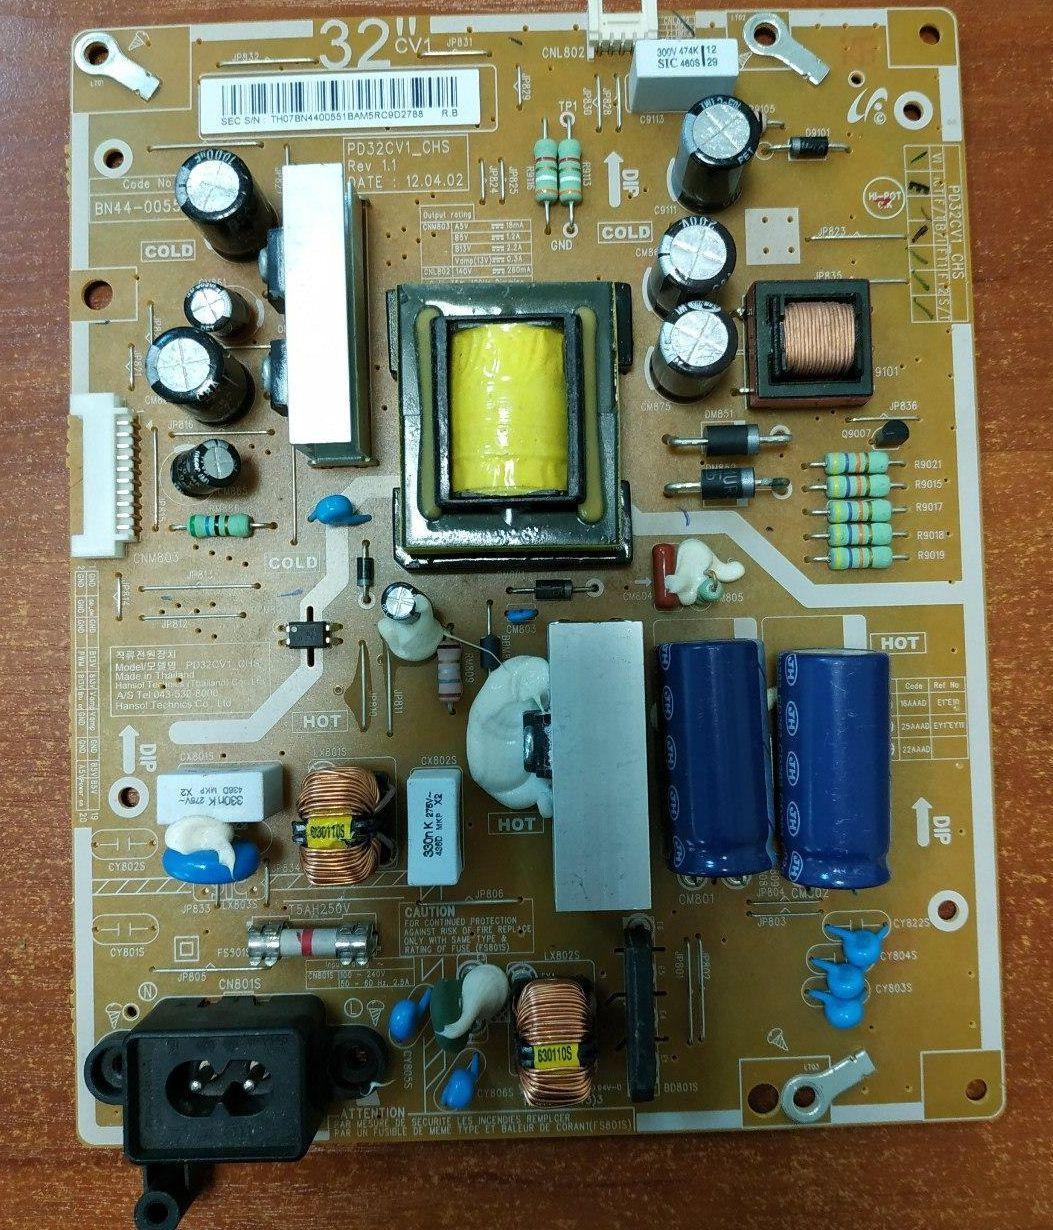 Блок питания BN44-00551B, PD32CV1_CHS для Samsung UE32EH6037